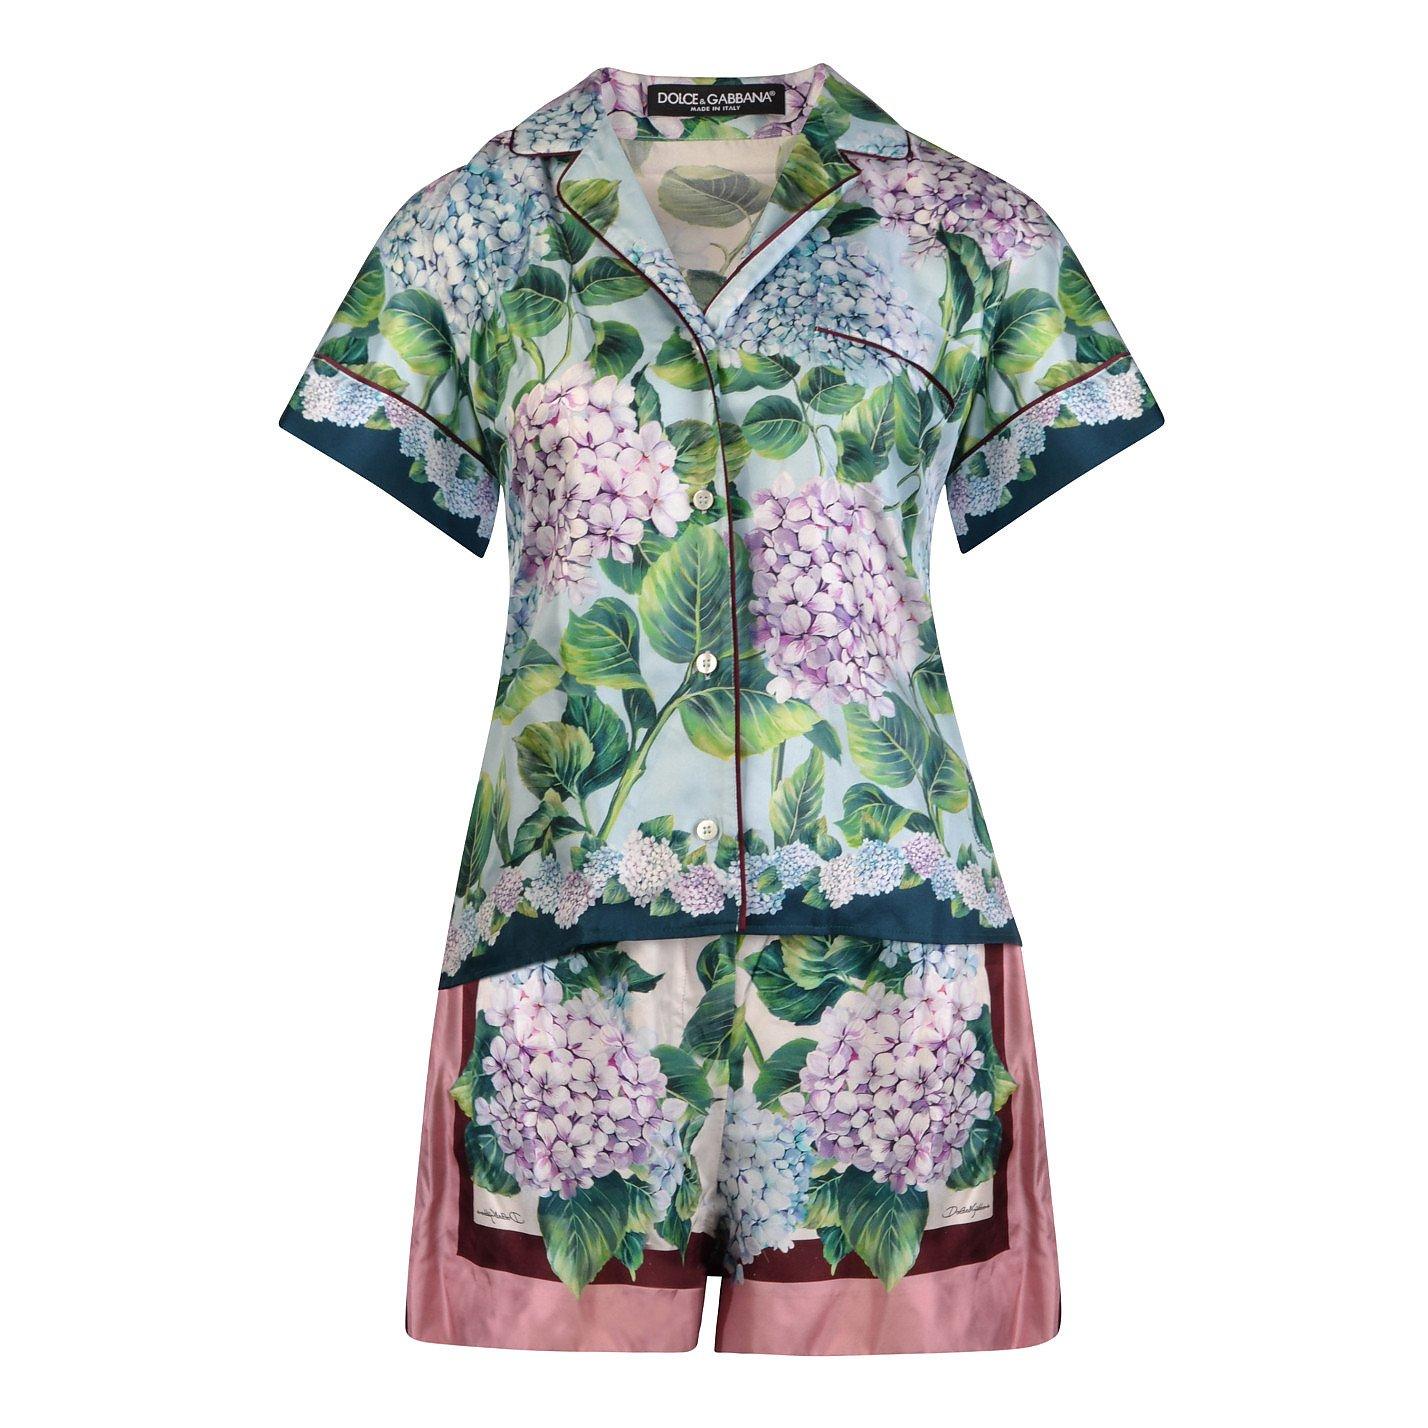 DOLCE & GABBANA Hydrangea Print Loungewear Set